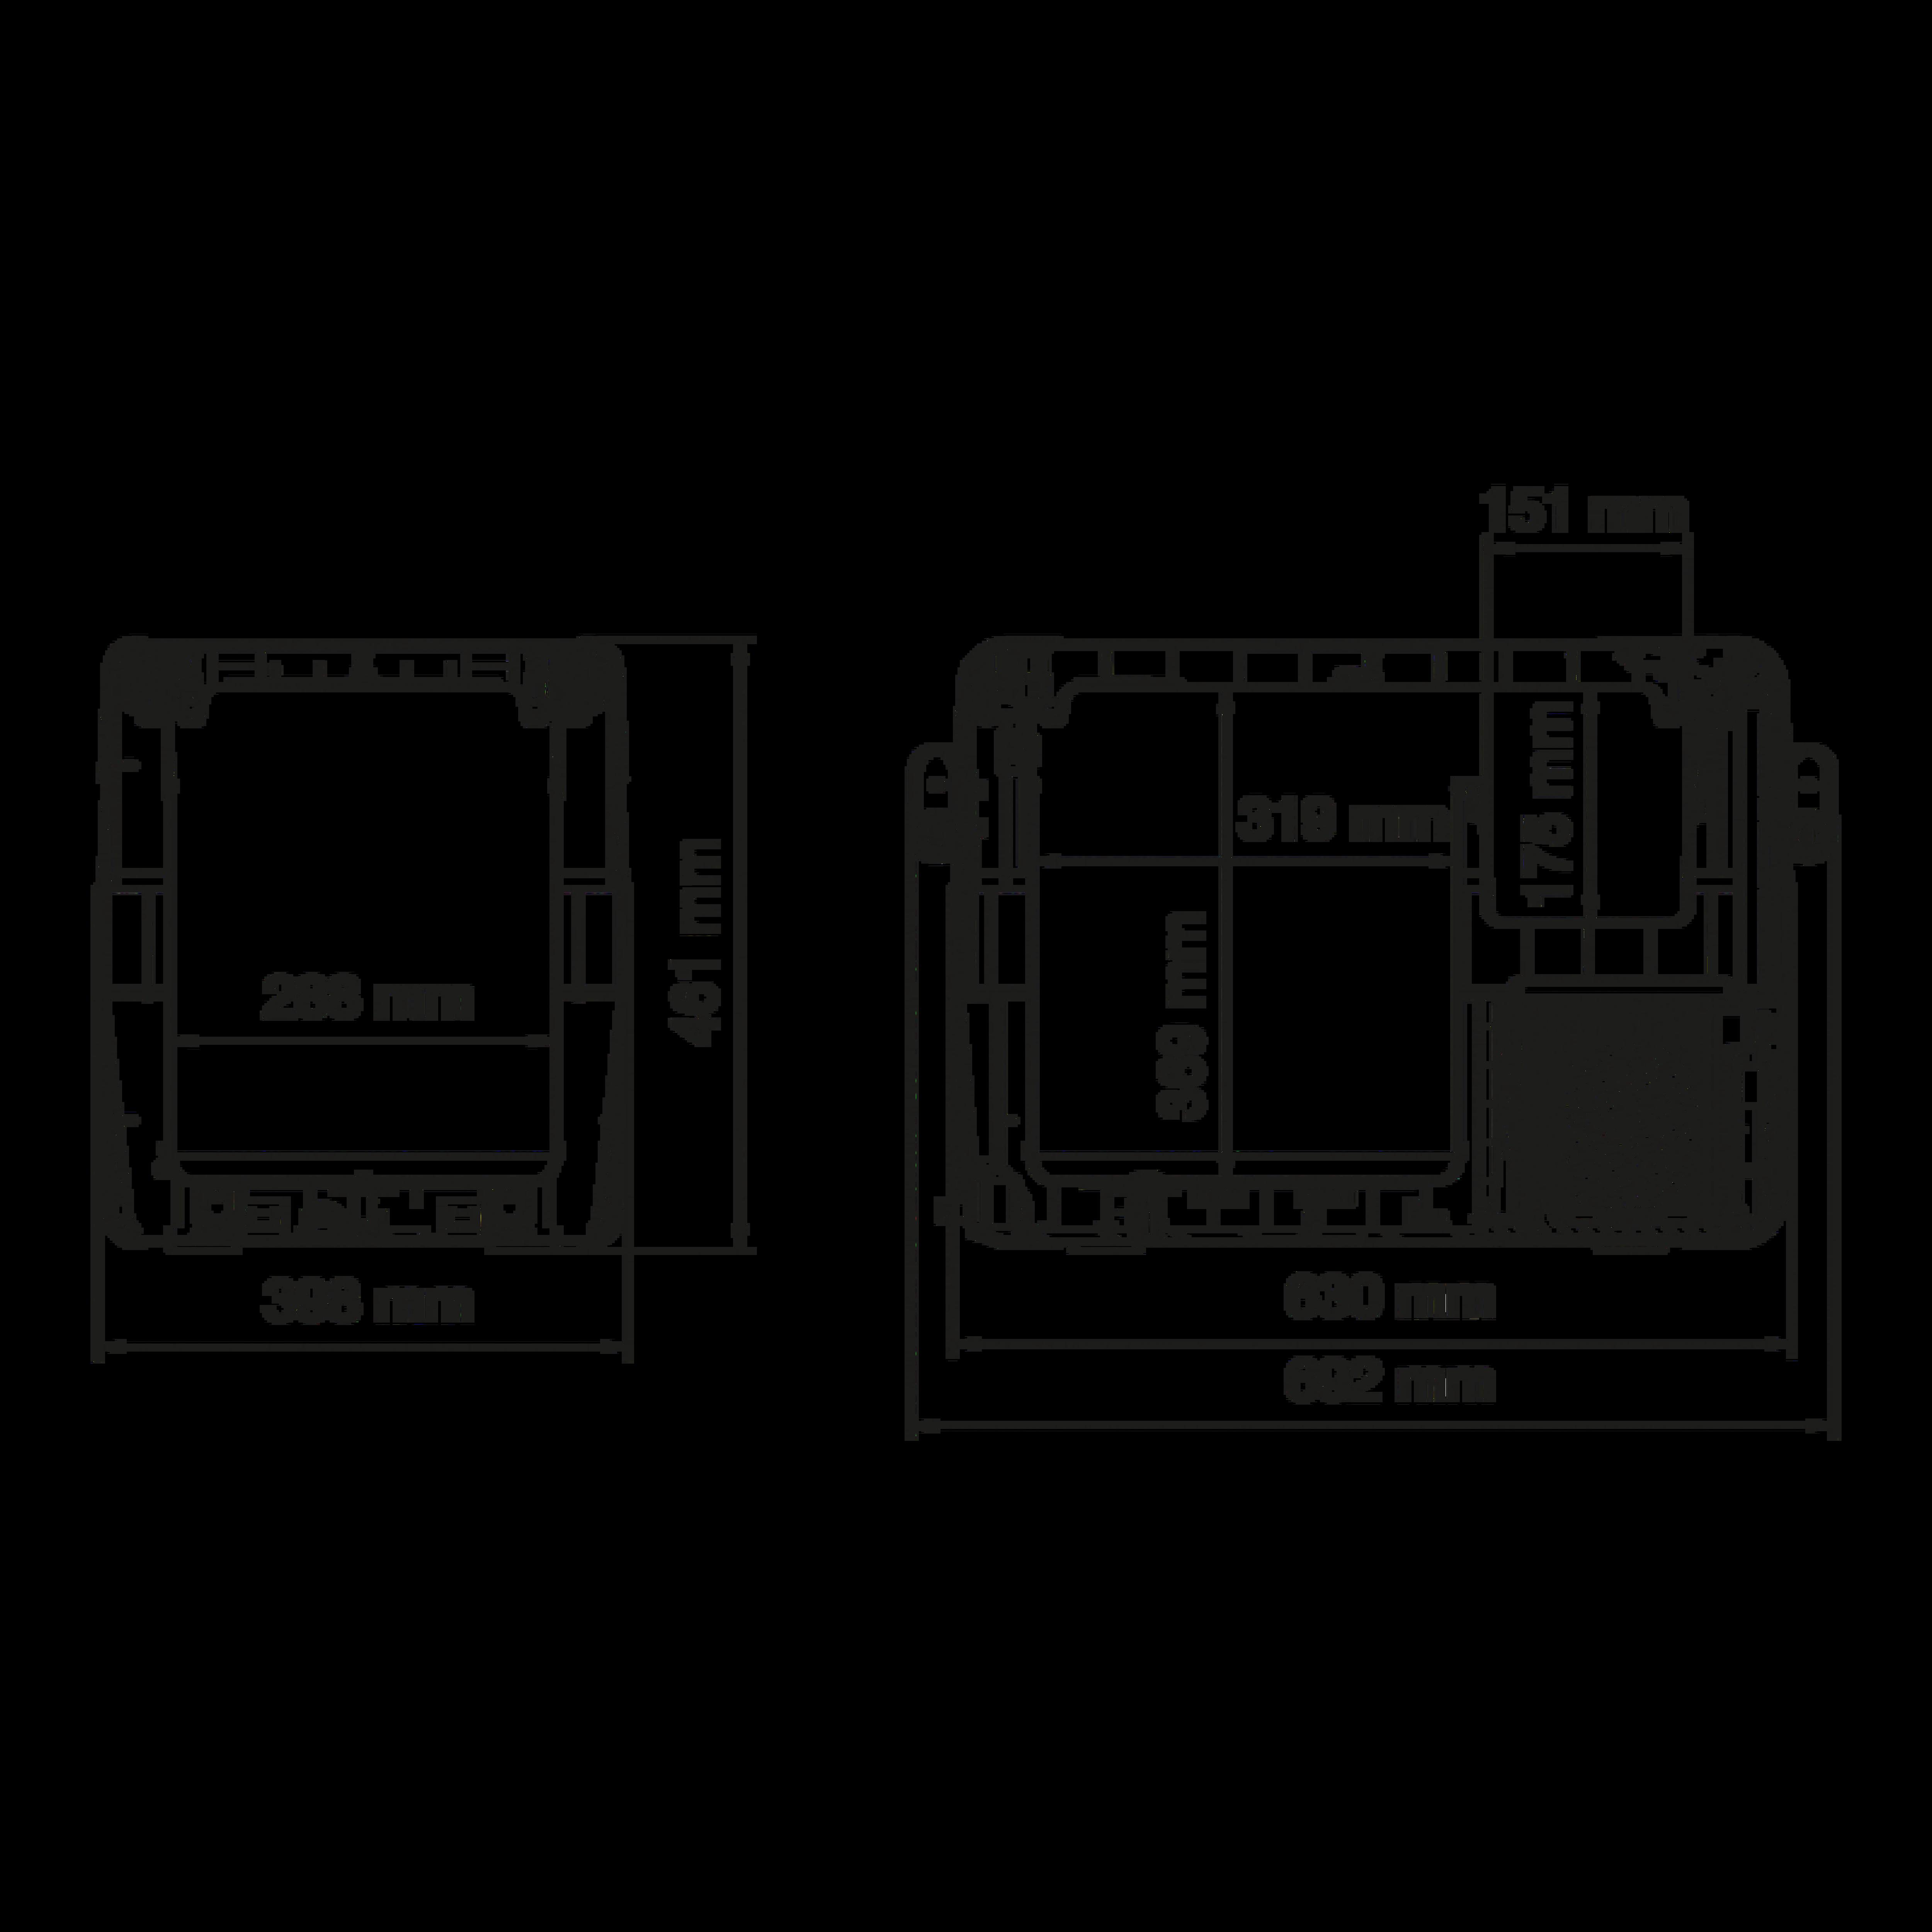 CFX 40 Dimensions